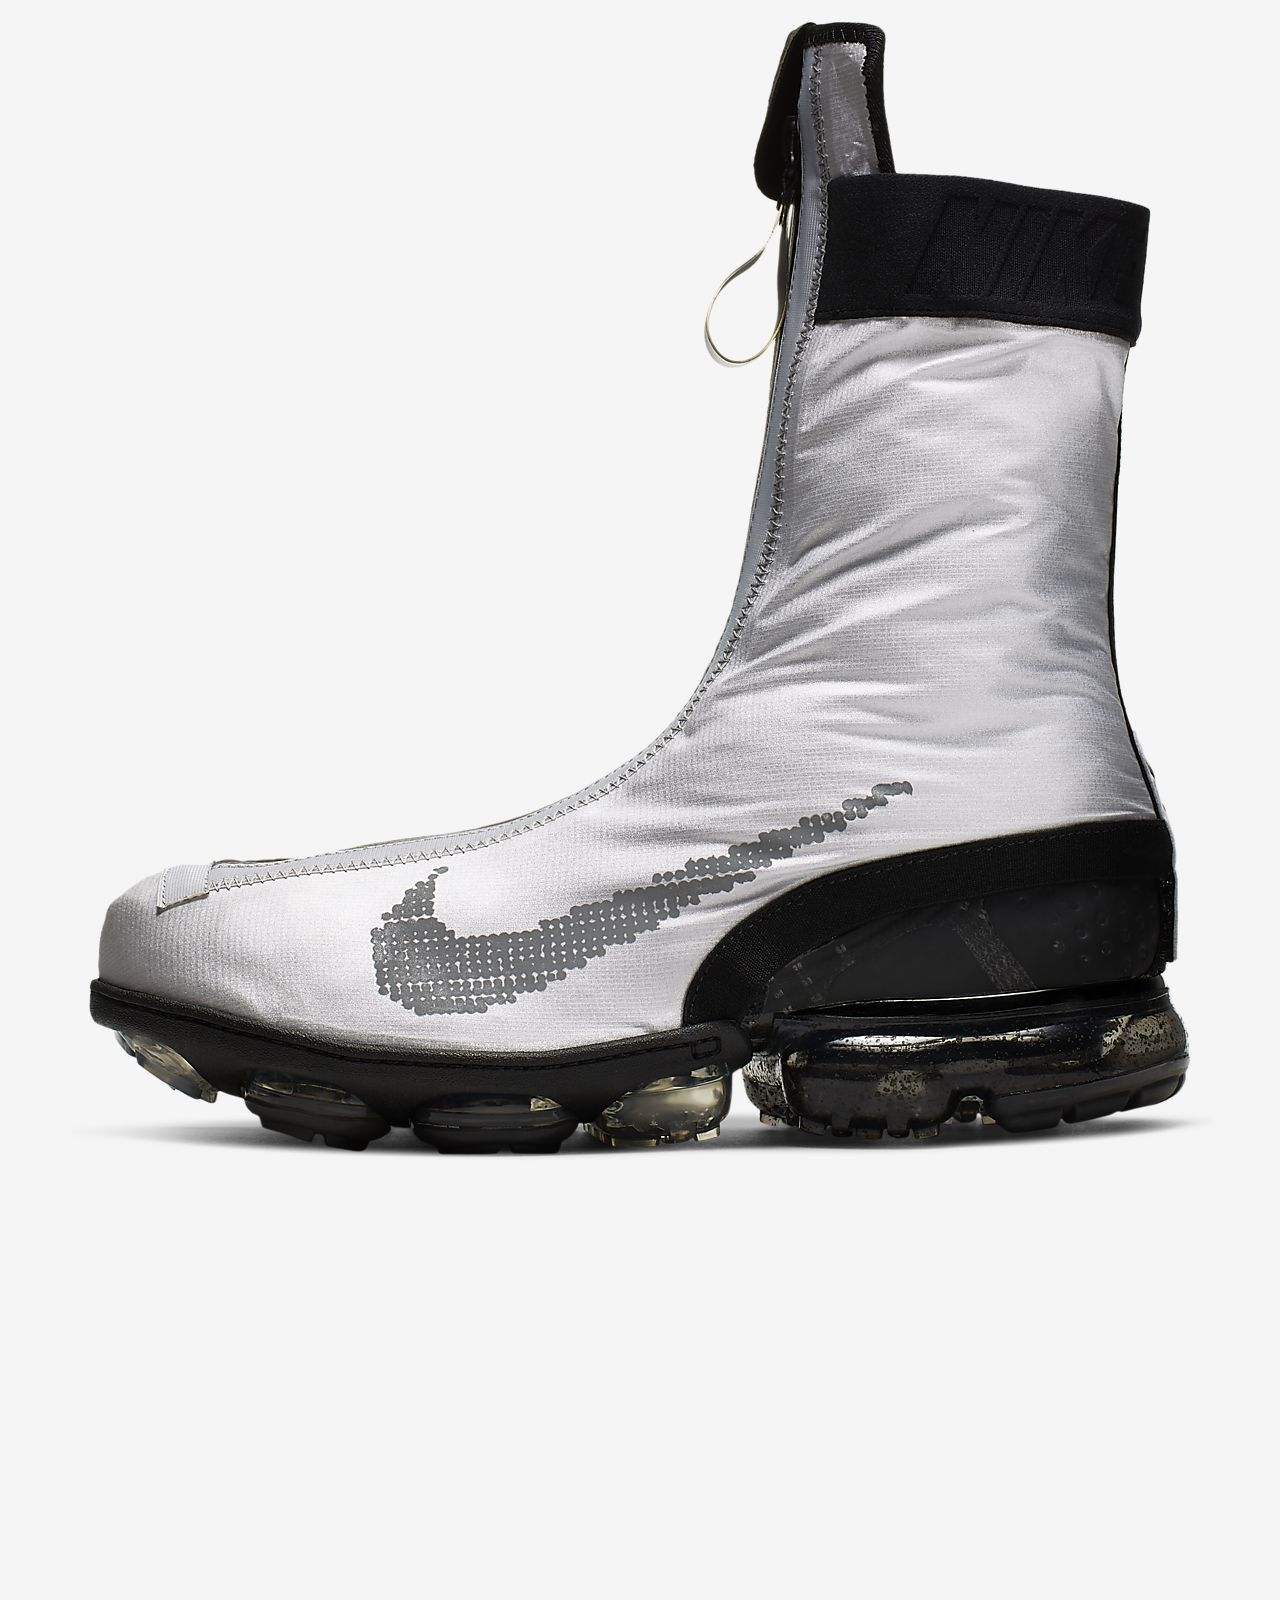 Nike Air VaporMax FlyKnit Gaiter ISPA-sko